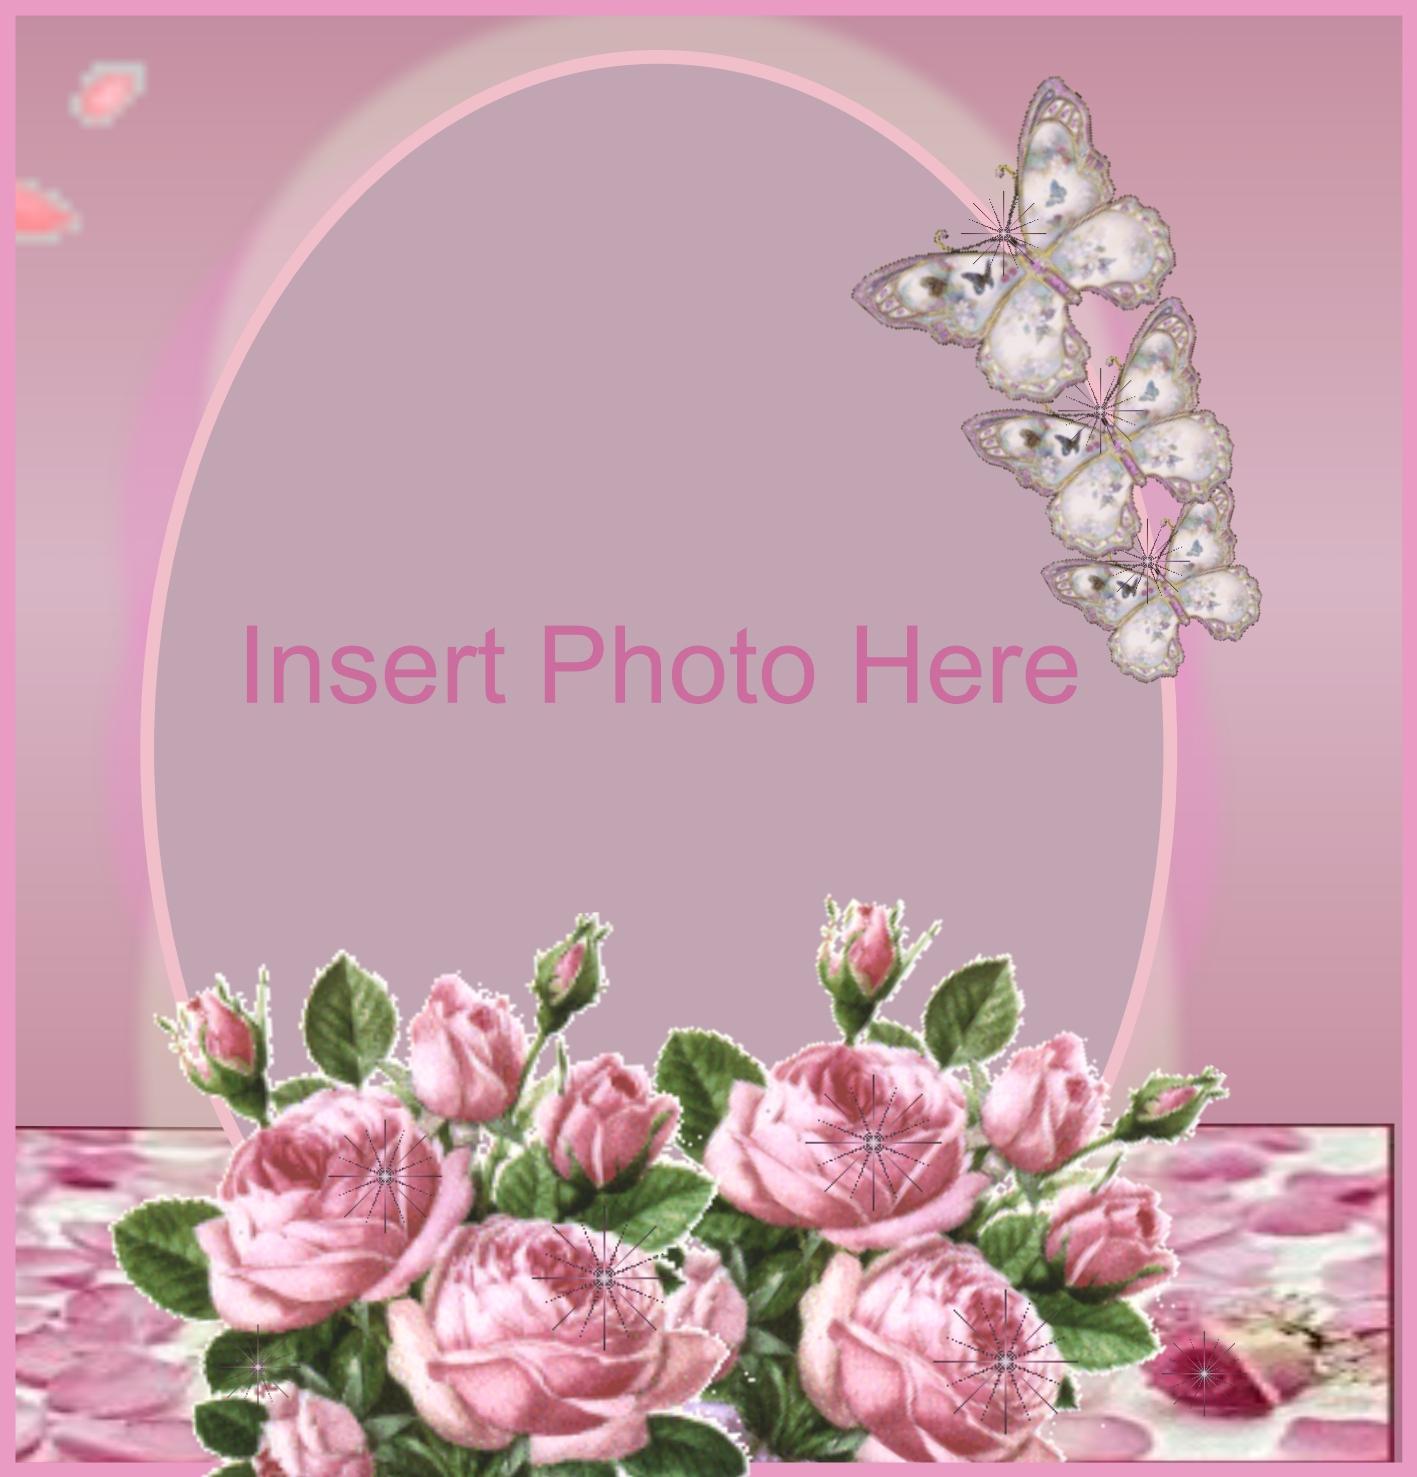 Imikimi beautiful flower frames framess imikimi zo picture frames 2008 april beautiful flower frame tjkstevens pictureframes izmirmasajfo